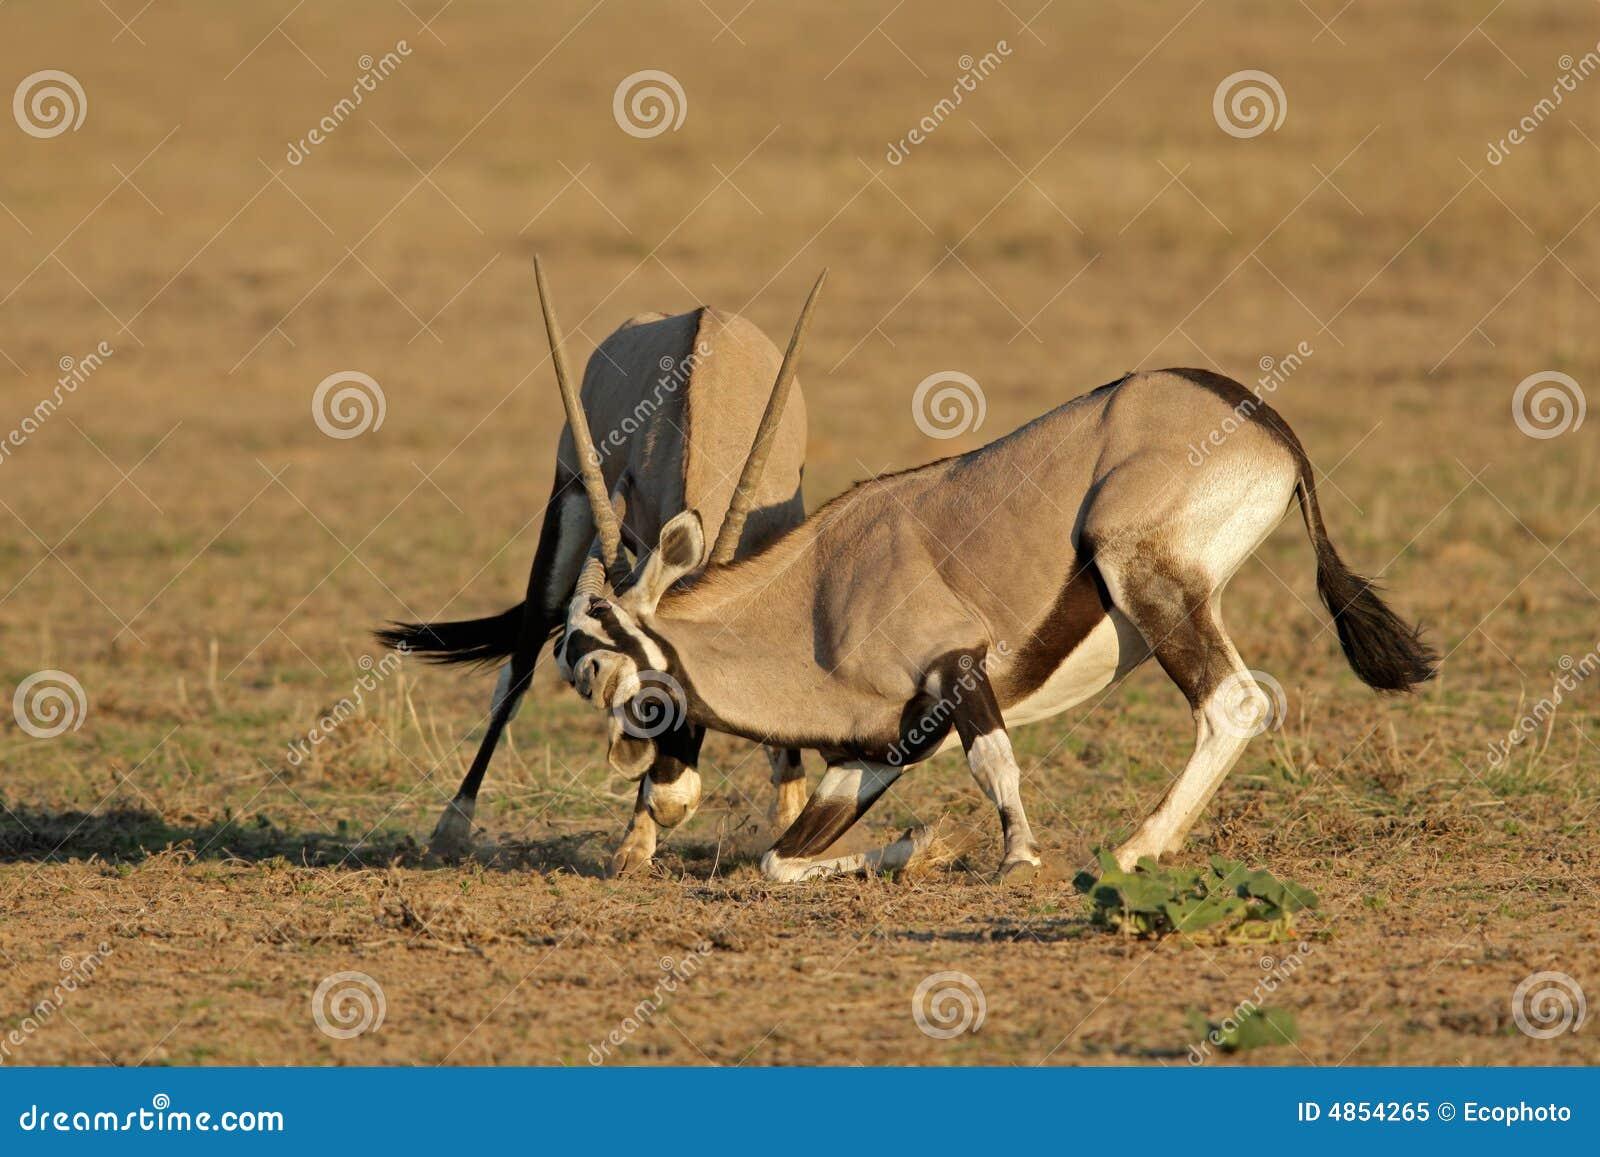 Fighting Gemsbok Royalty Free Stock Photo - Image: 4854265